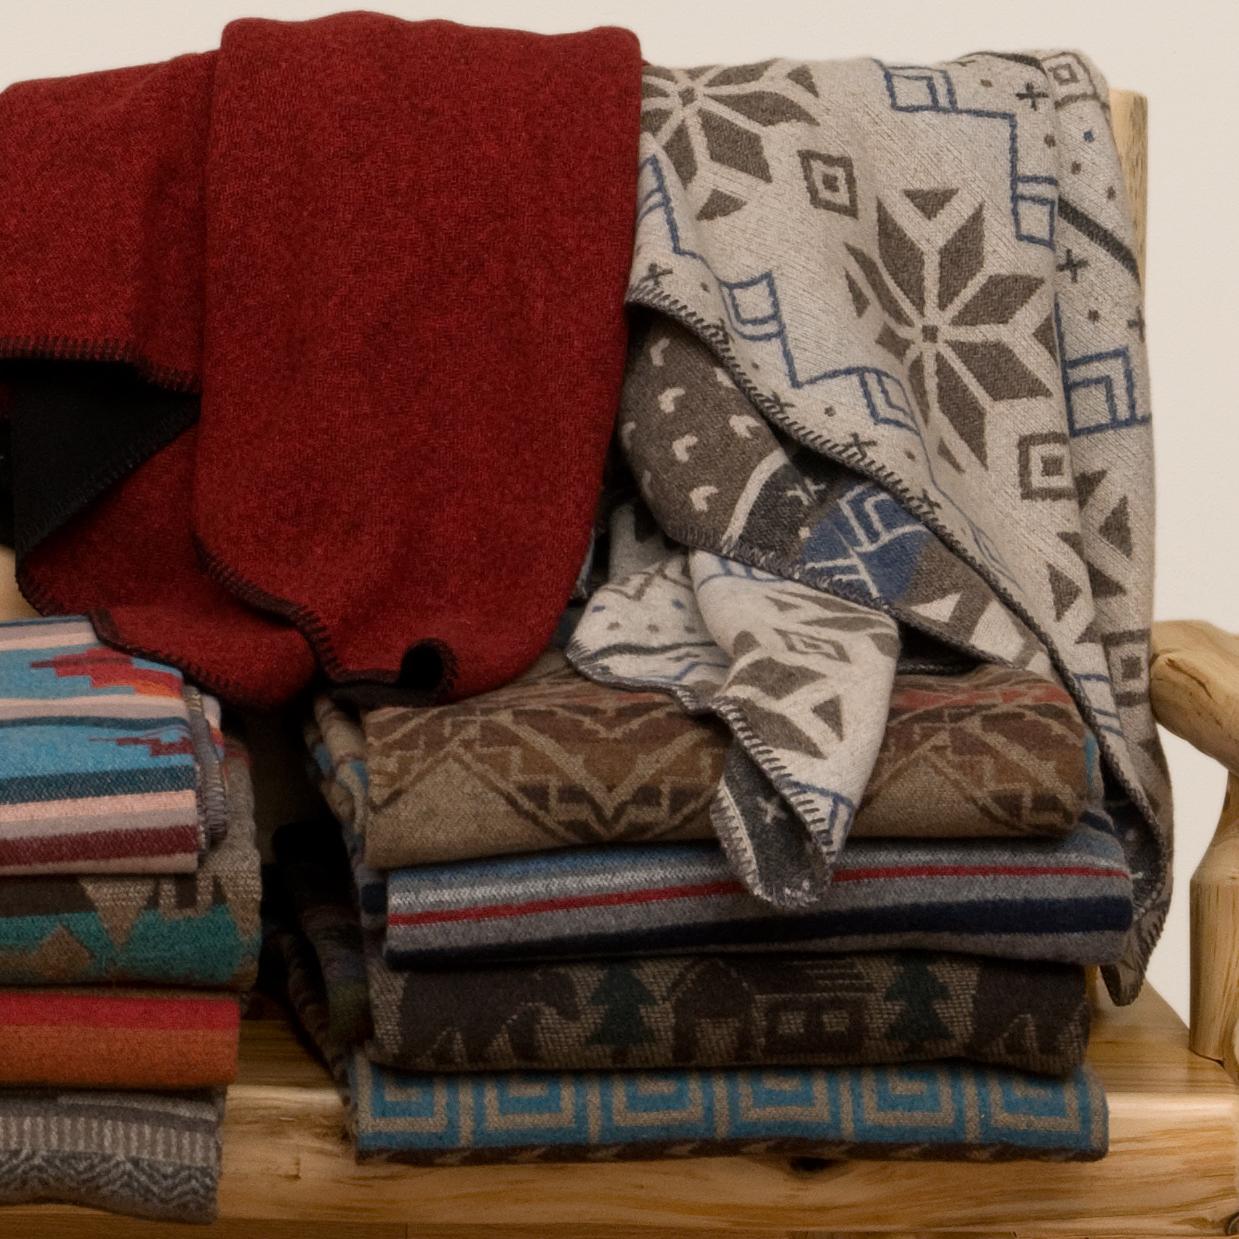 Wool Throws & Pillows -